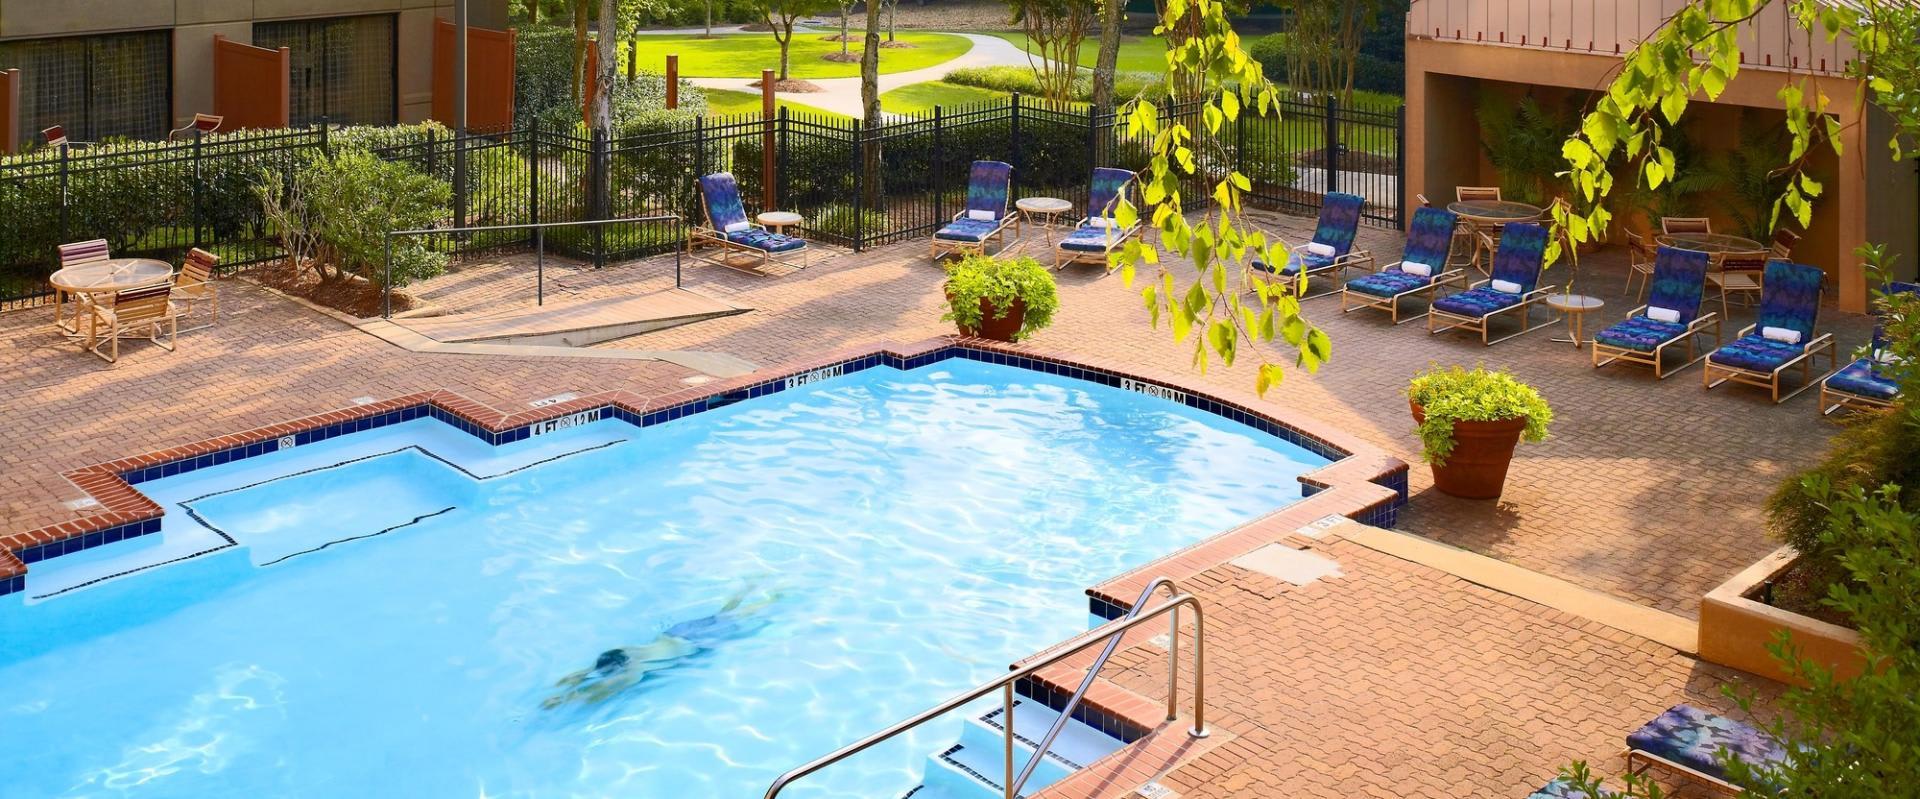 Sonesta Gwinnett Place Atlanta - Pool